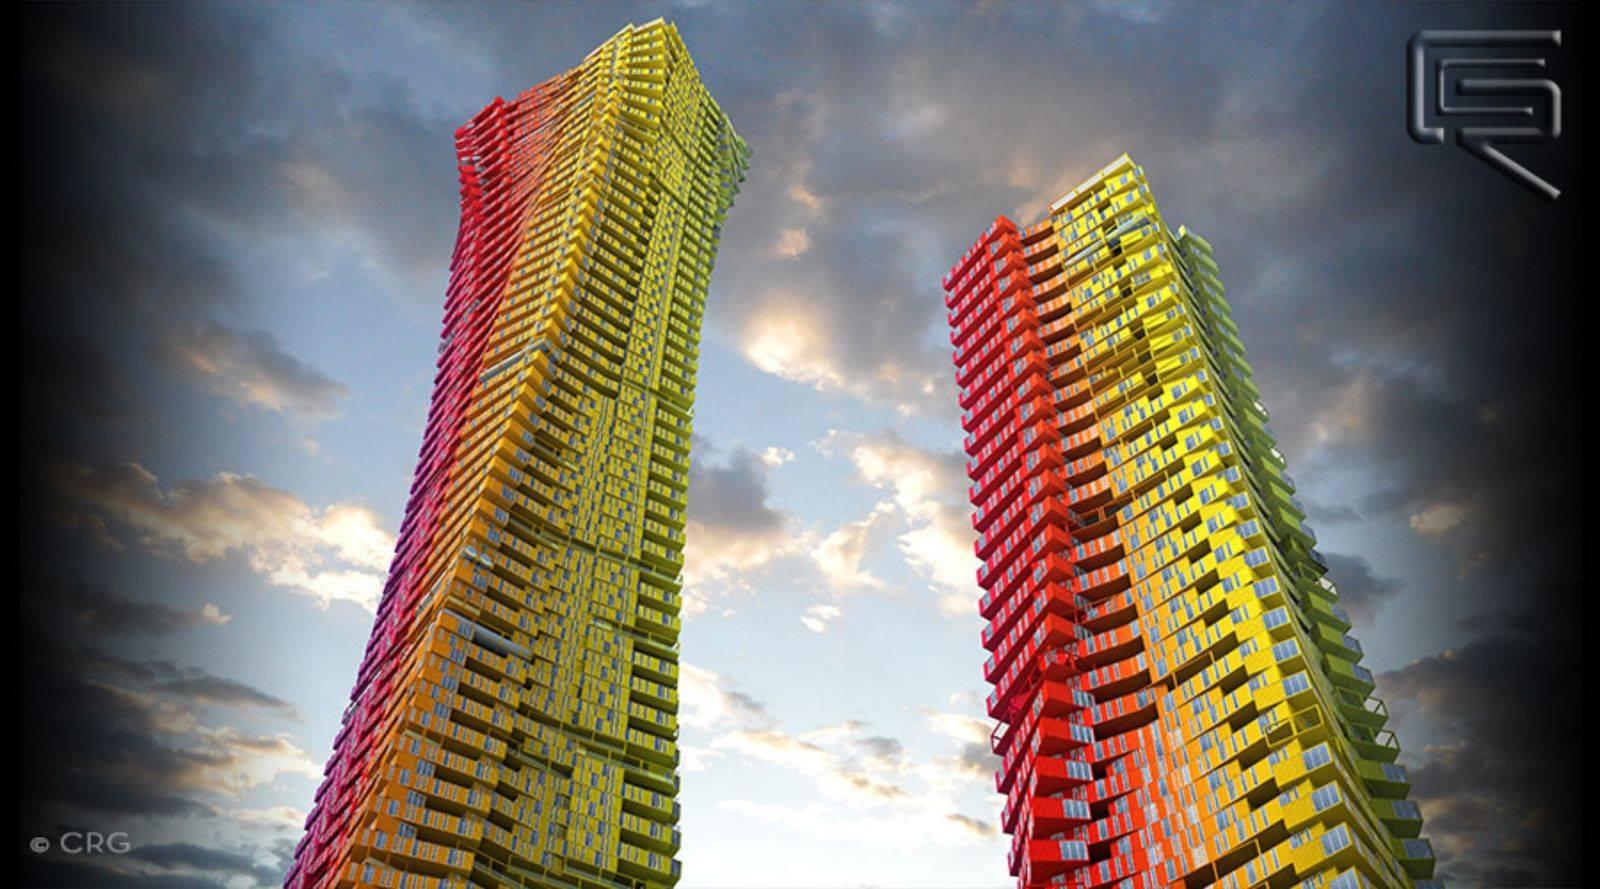 Rascacielos construido con contenedores